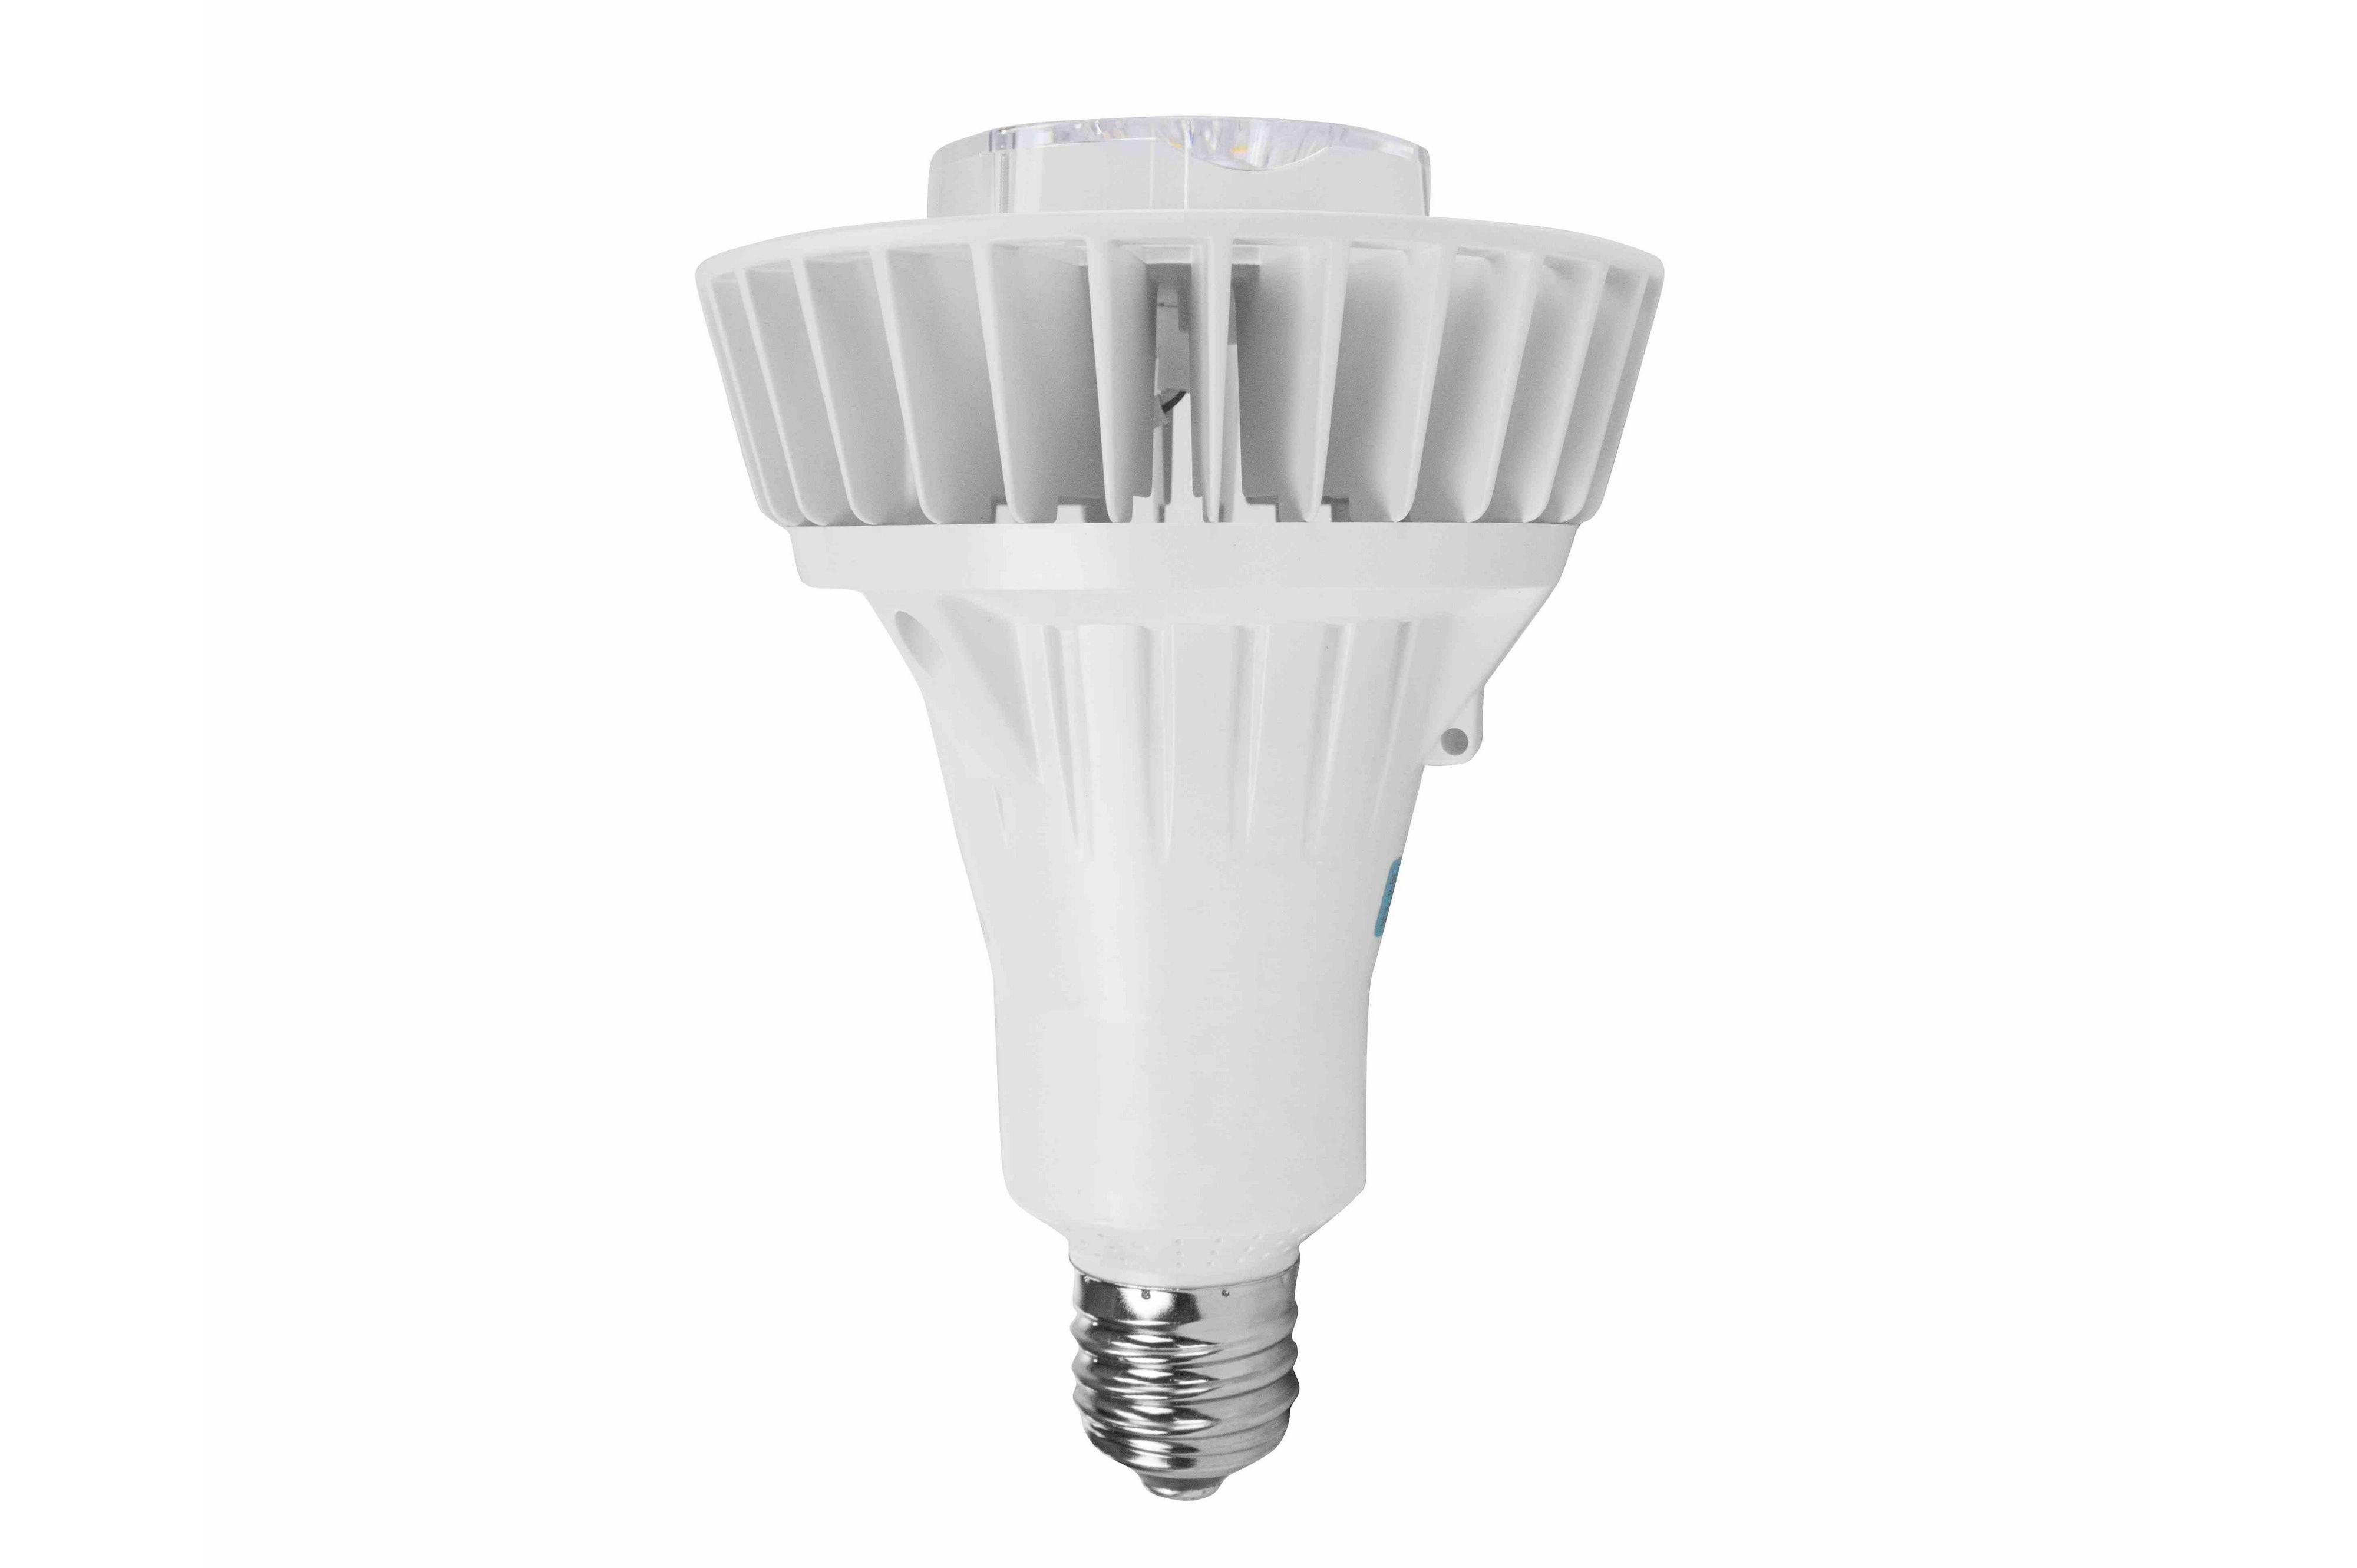 43 watt bt56 led lamp 4 200 lumens e39 screw base 120 277v ac replace metal halide and. Black Bedroom Furniture Sets. Home Design Ideas